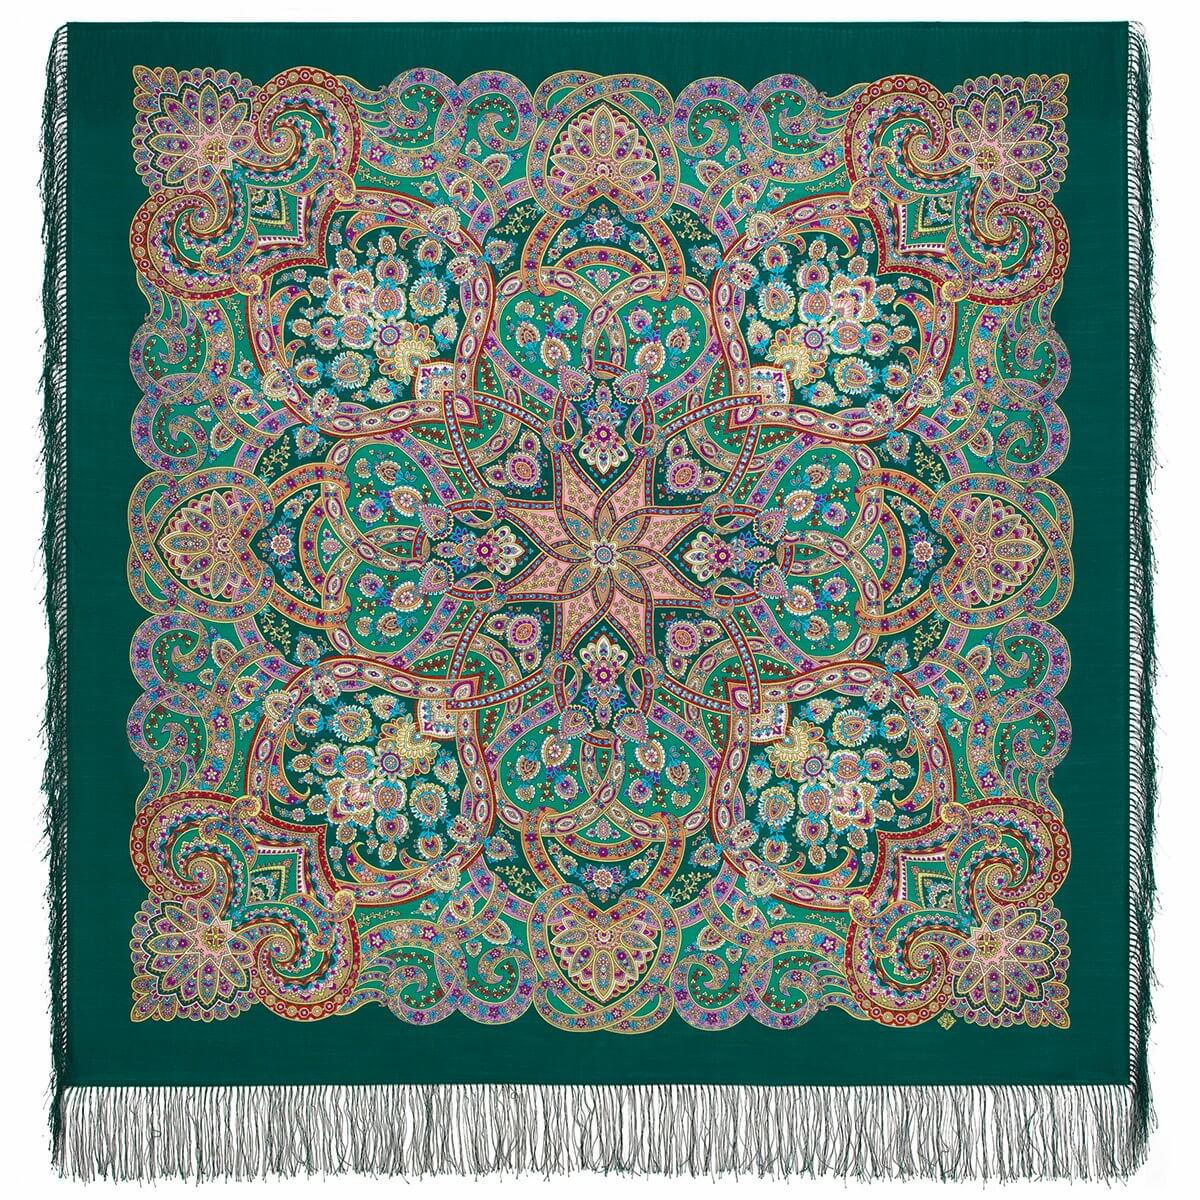 Pavlovo posad shawl «Festive City» 1921-9